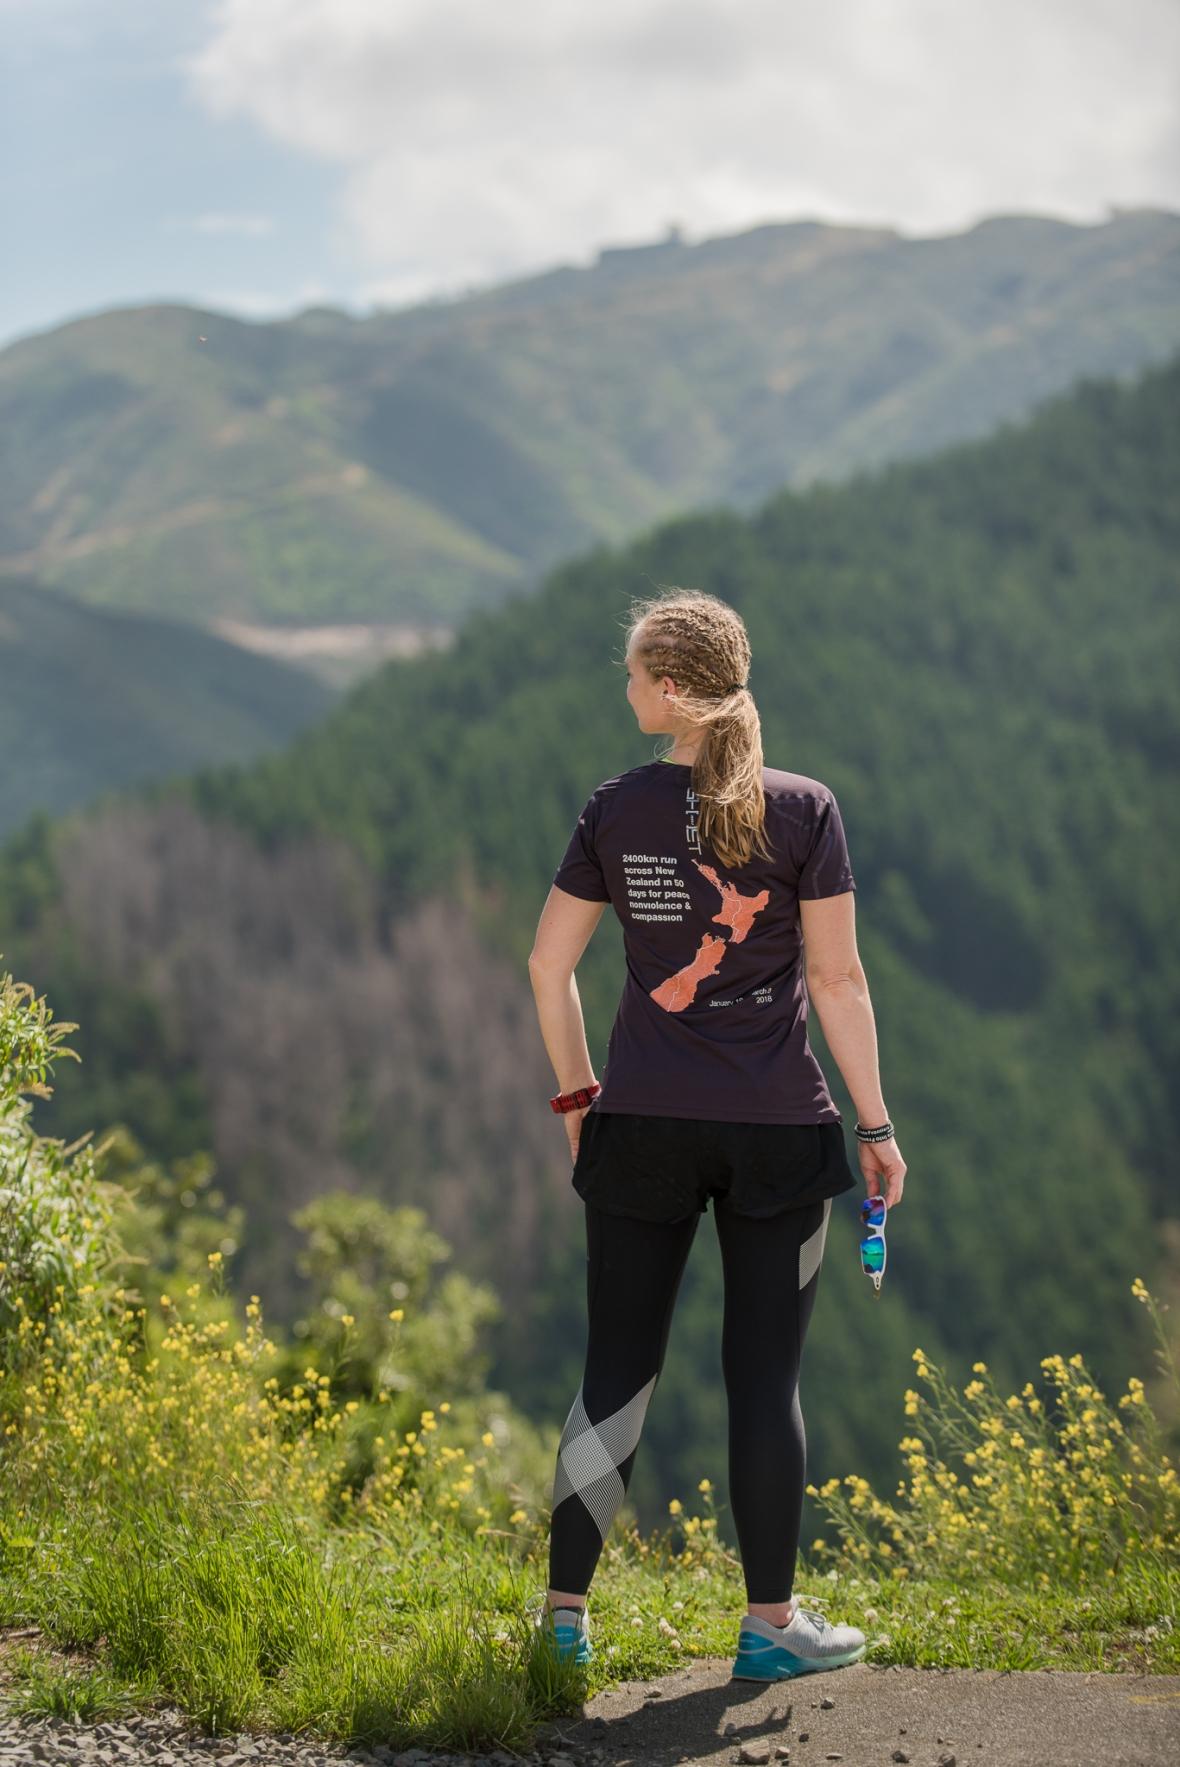 Emilia Lahti Sisu not silence on a run through NZ